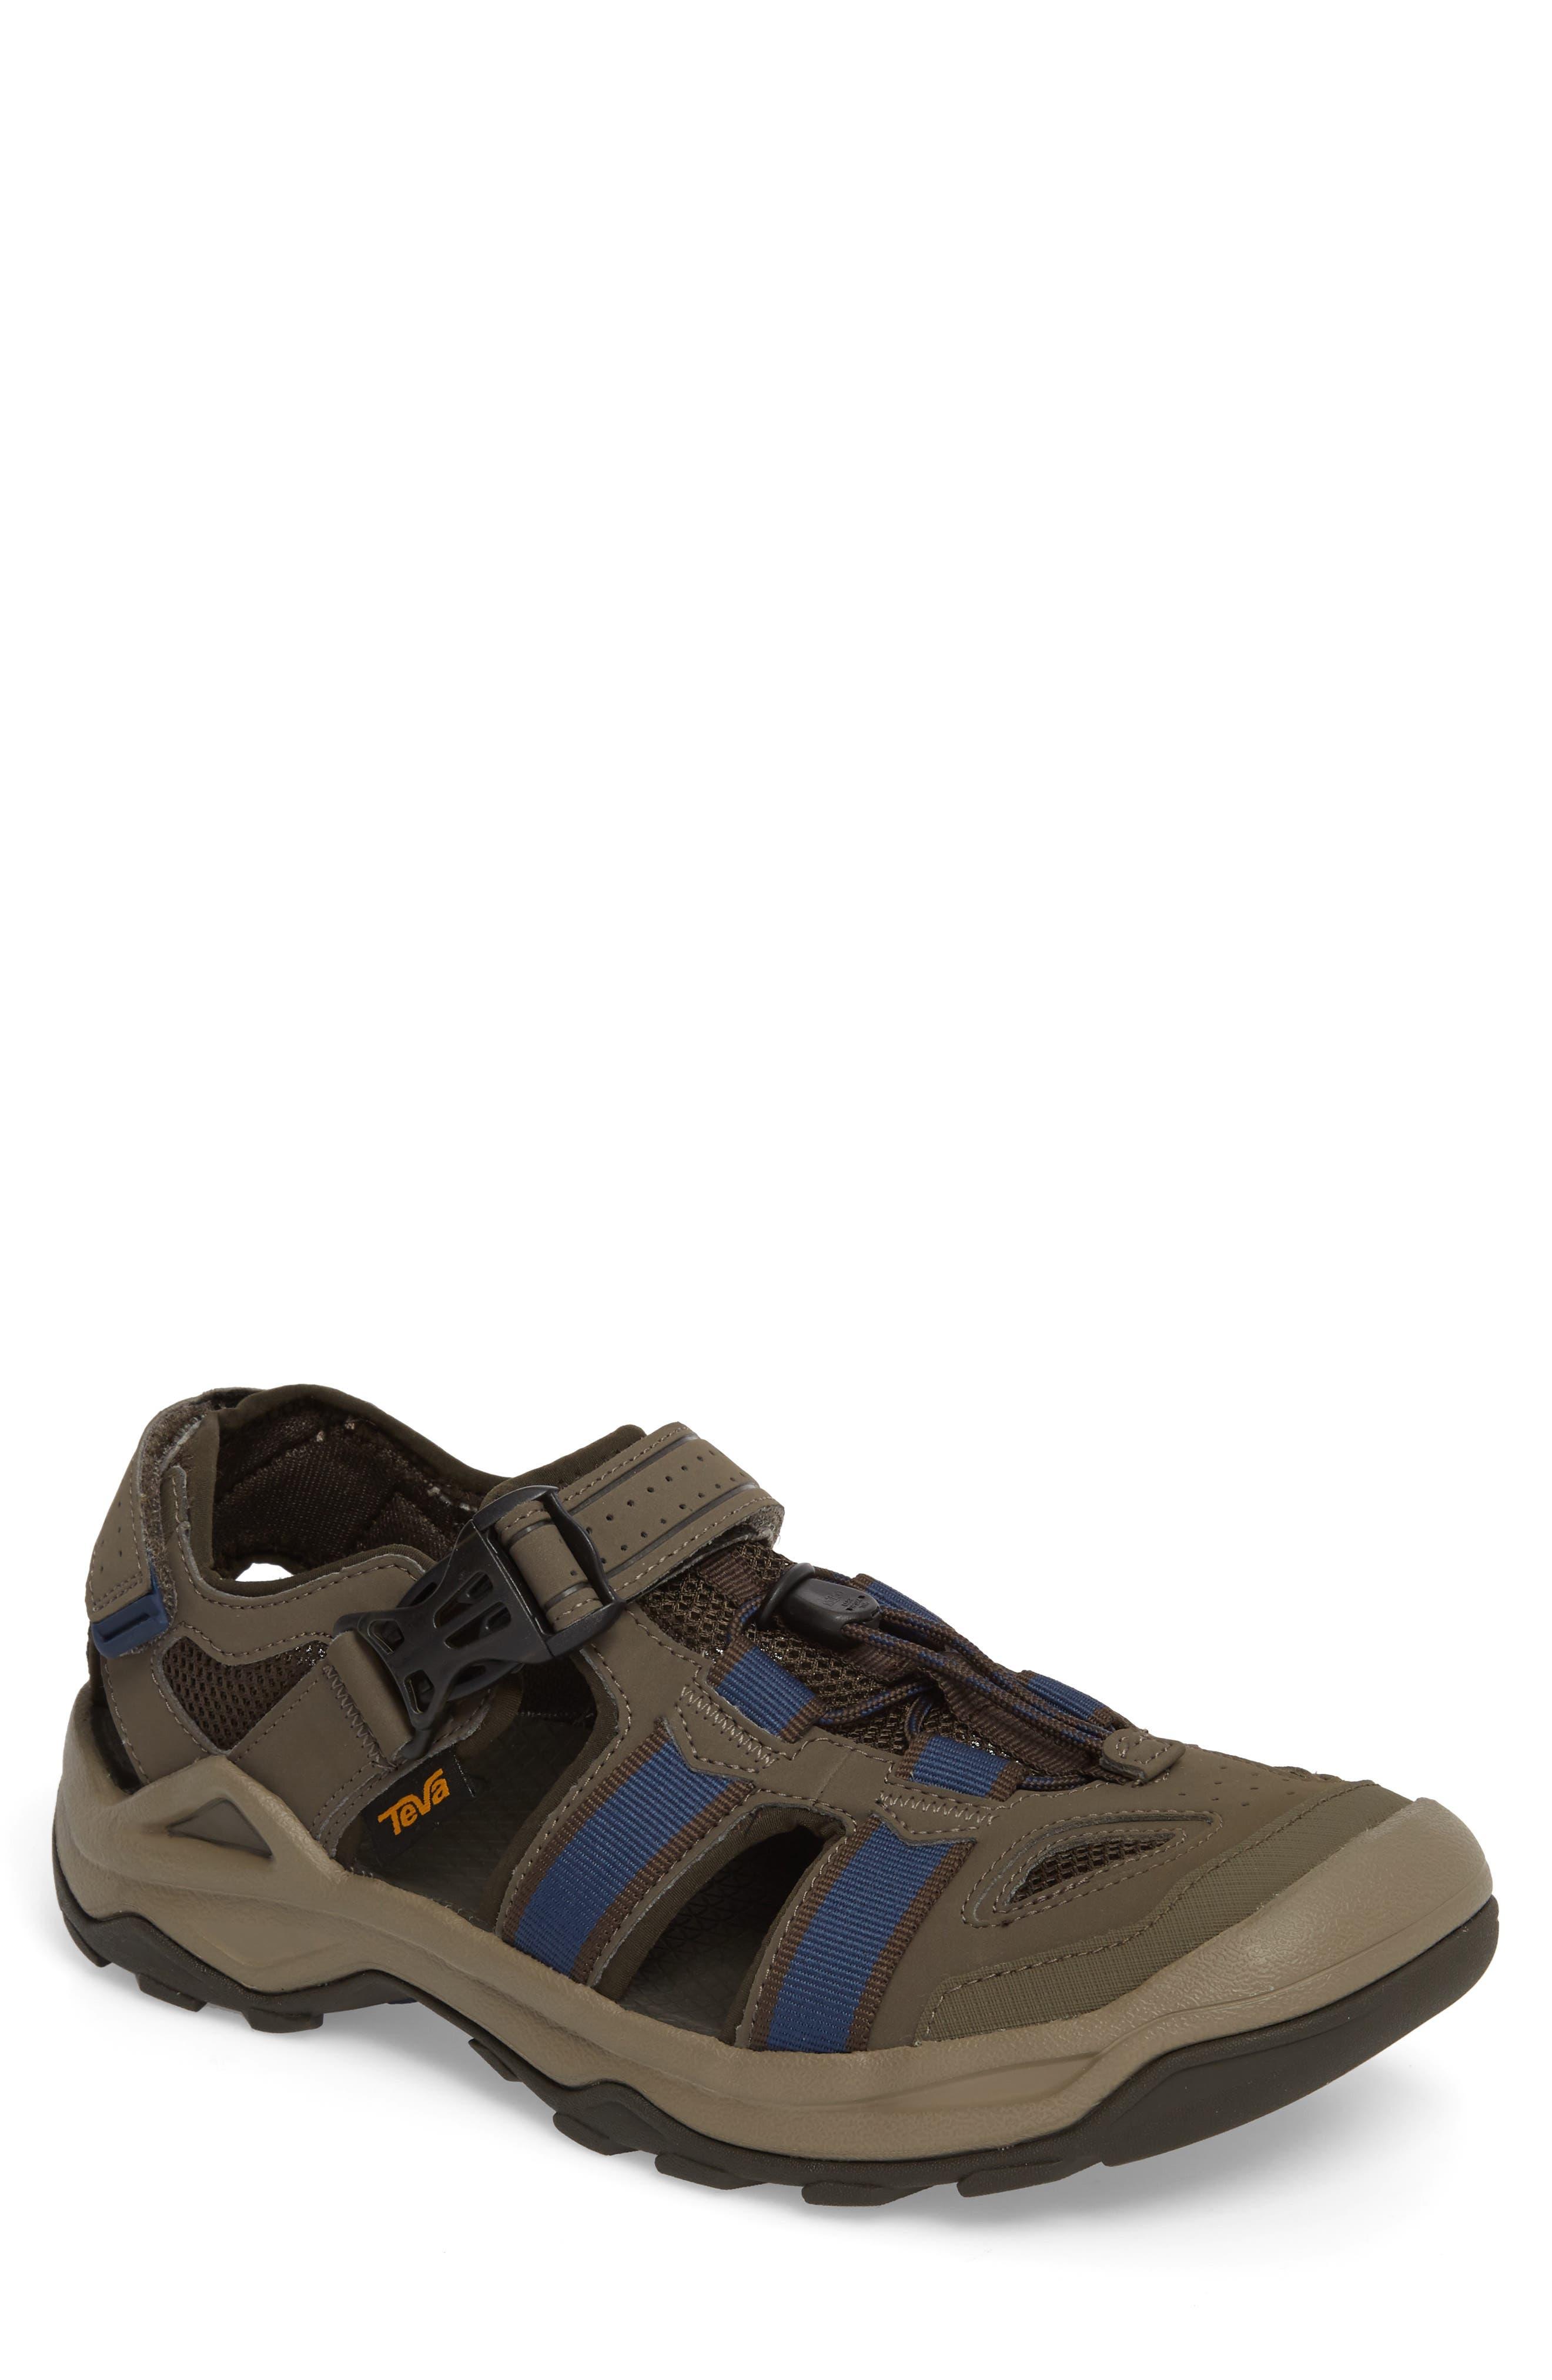 Omnium 2 Hiking Sandal,                             Main thumbnail 1, color,                             Brown Nylon